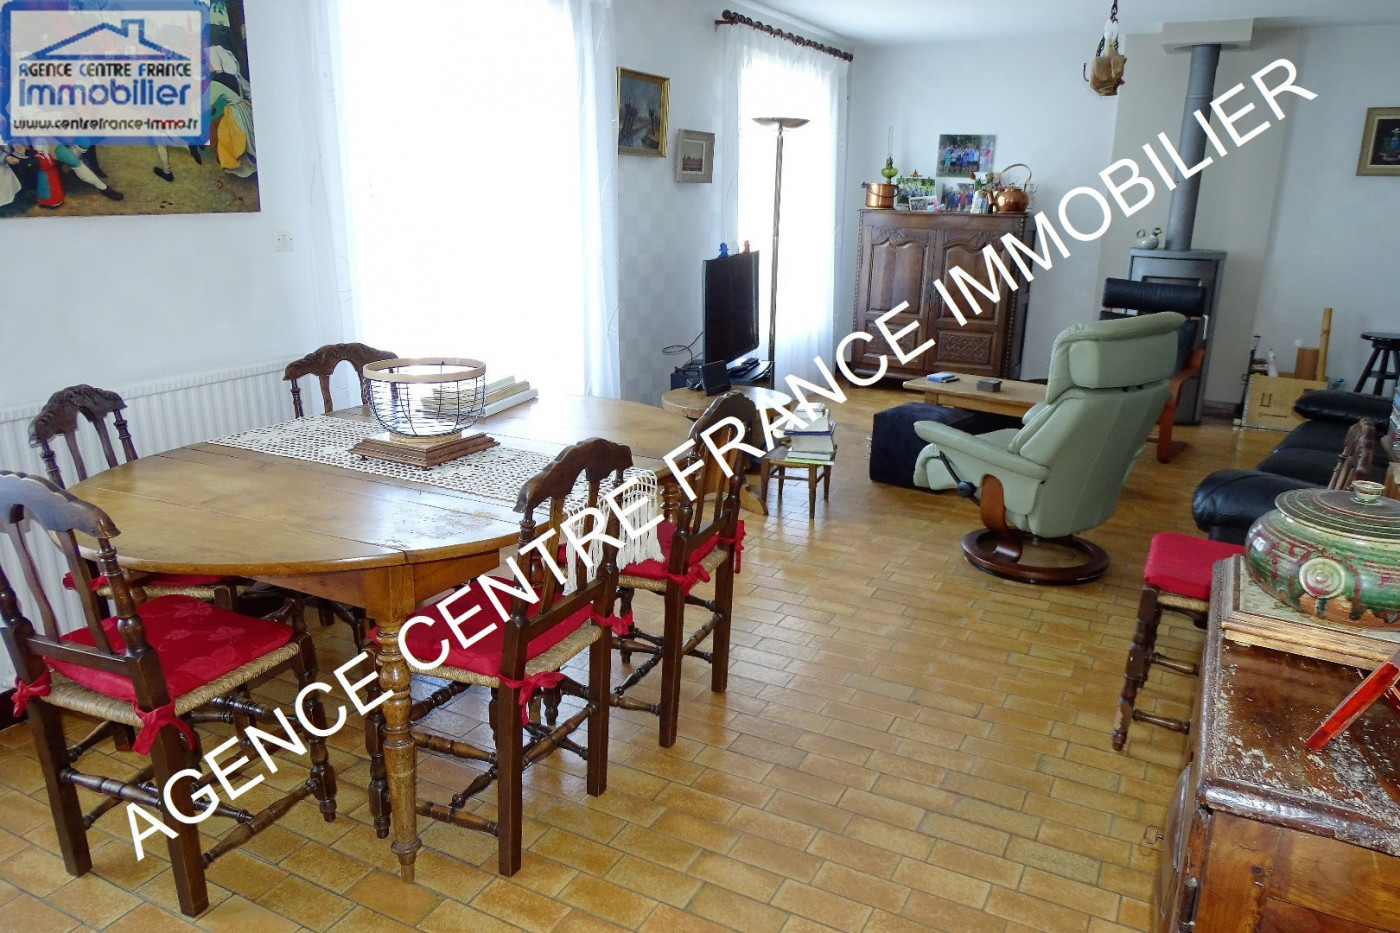 A vendre  Bourges | Réf 030011417 - Agence centre france immobilier